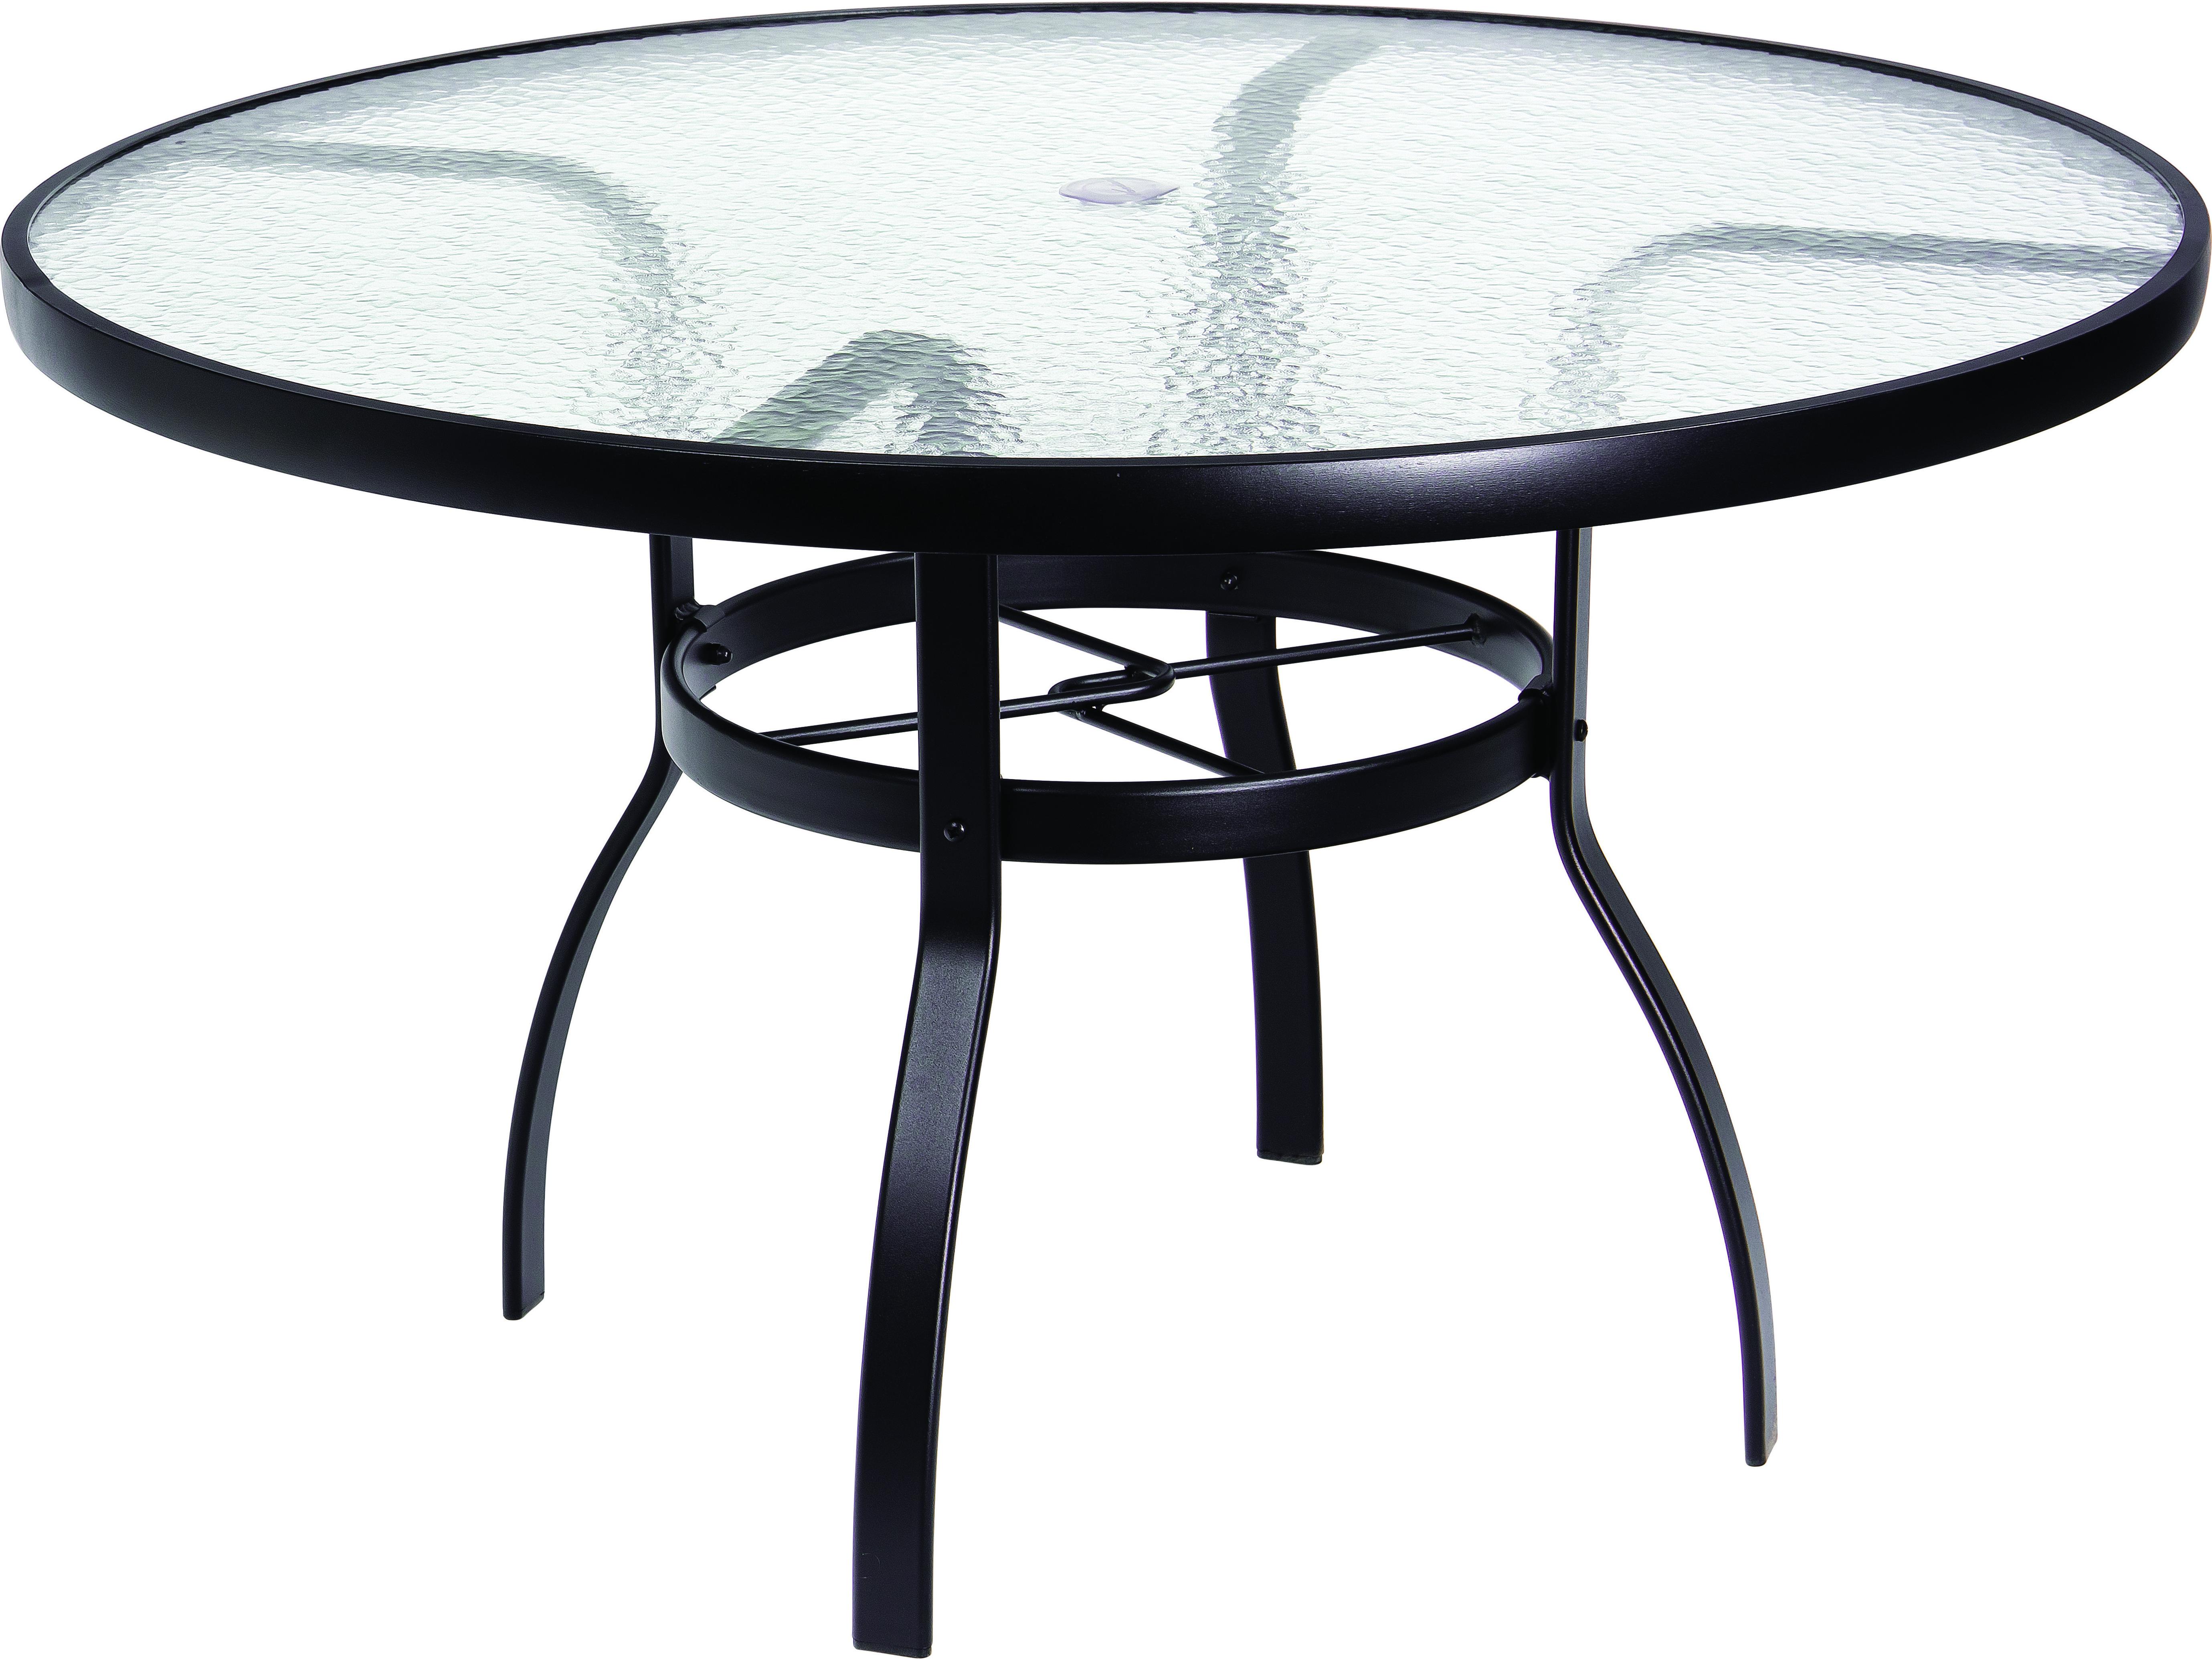 woodard ramsgate aluminum dining set ramds. Black Bedroom Furniture Sets. Home Design Ideas